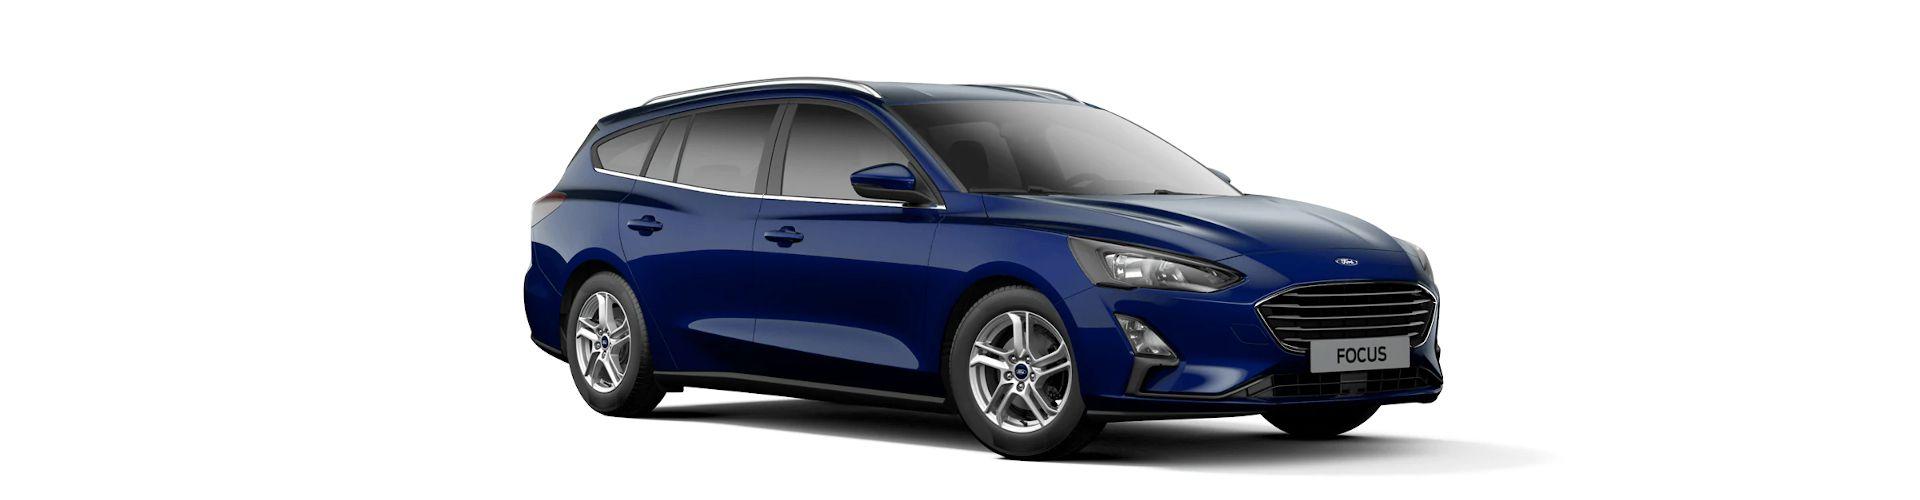 Ford Focus Trend - Α. Λιάπης Αντιπροσωπεία